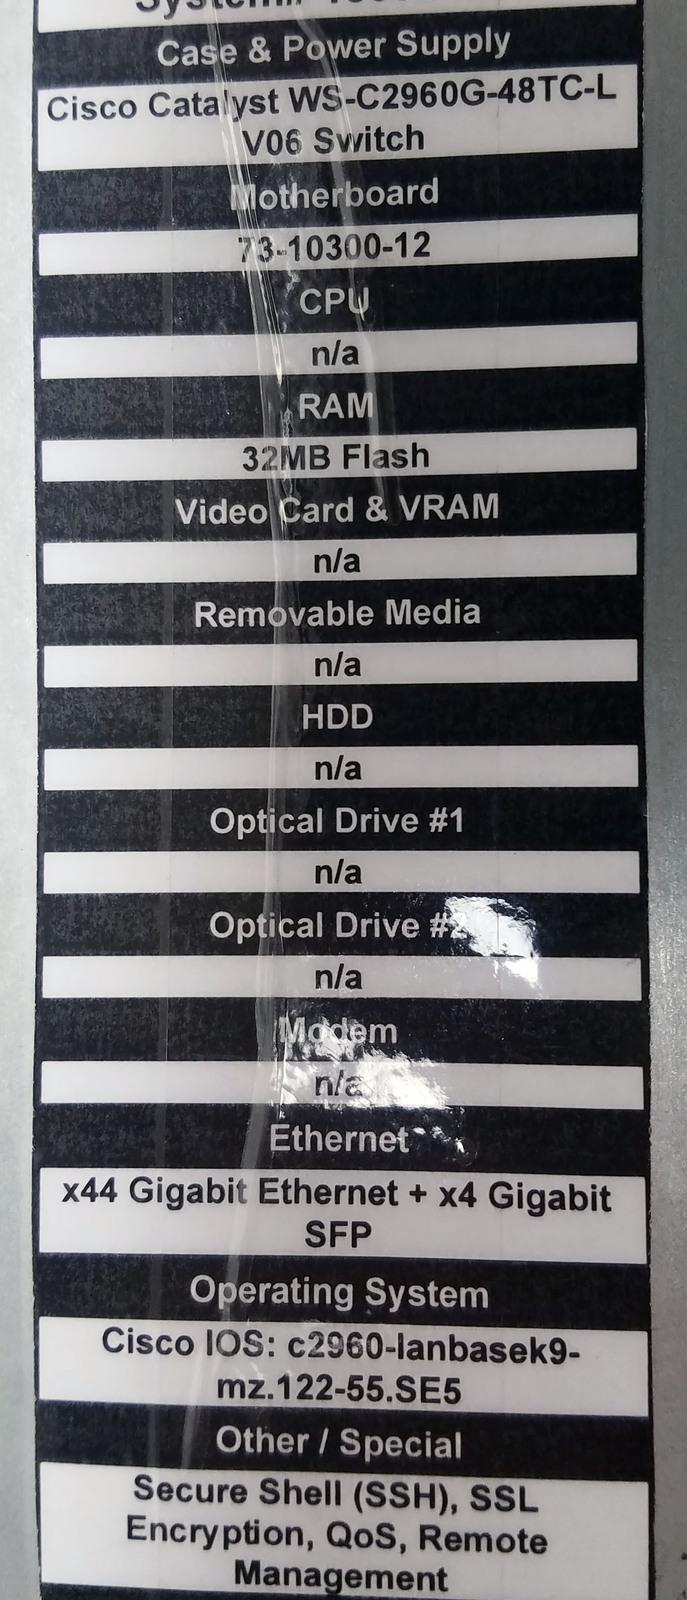 Cisco Catalyst WS-C2960G-48TC-L V06 48 Port Gigabit Switch Bin: 1